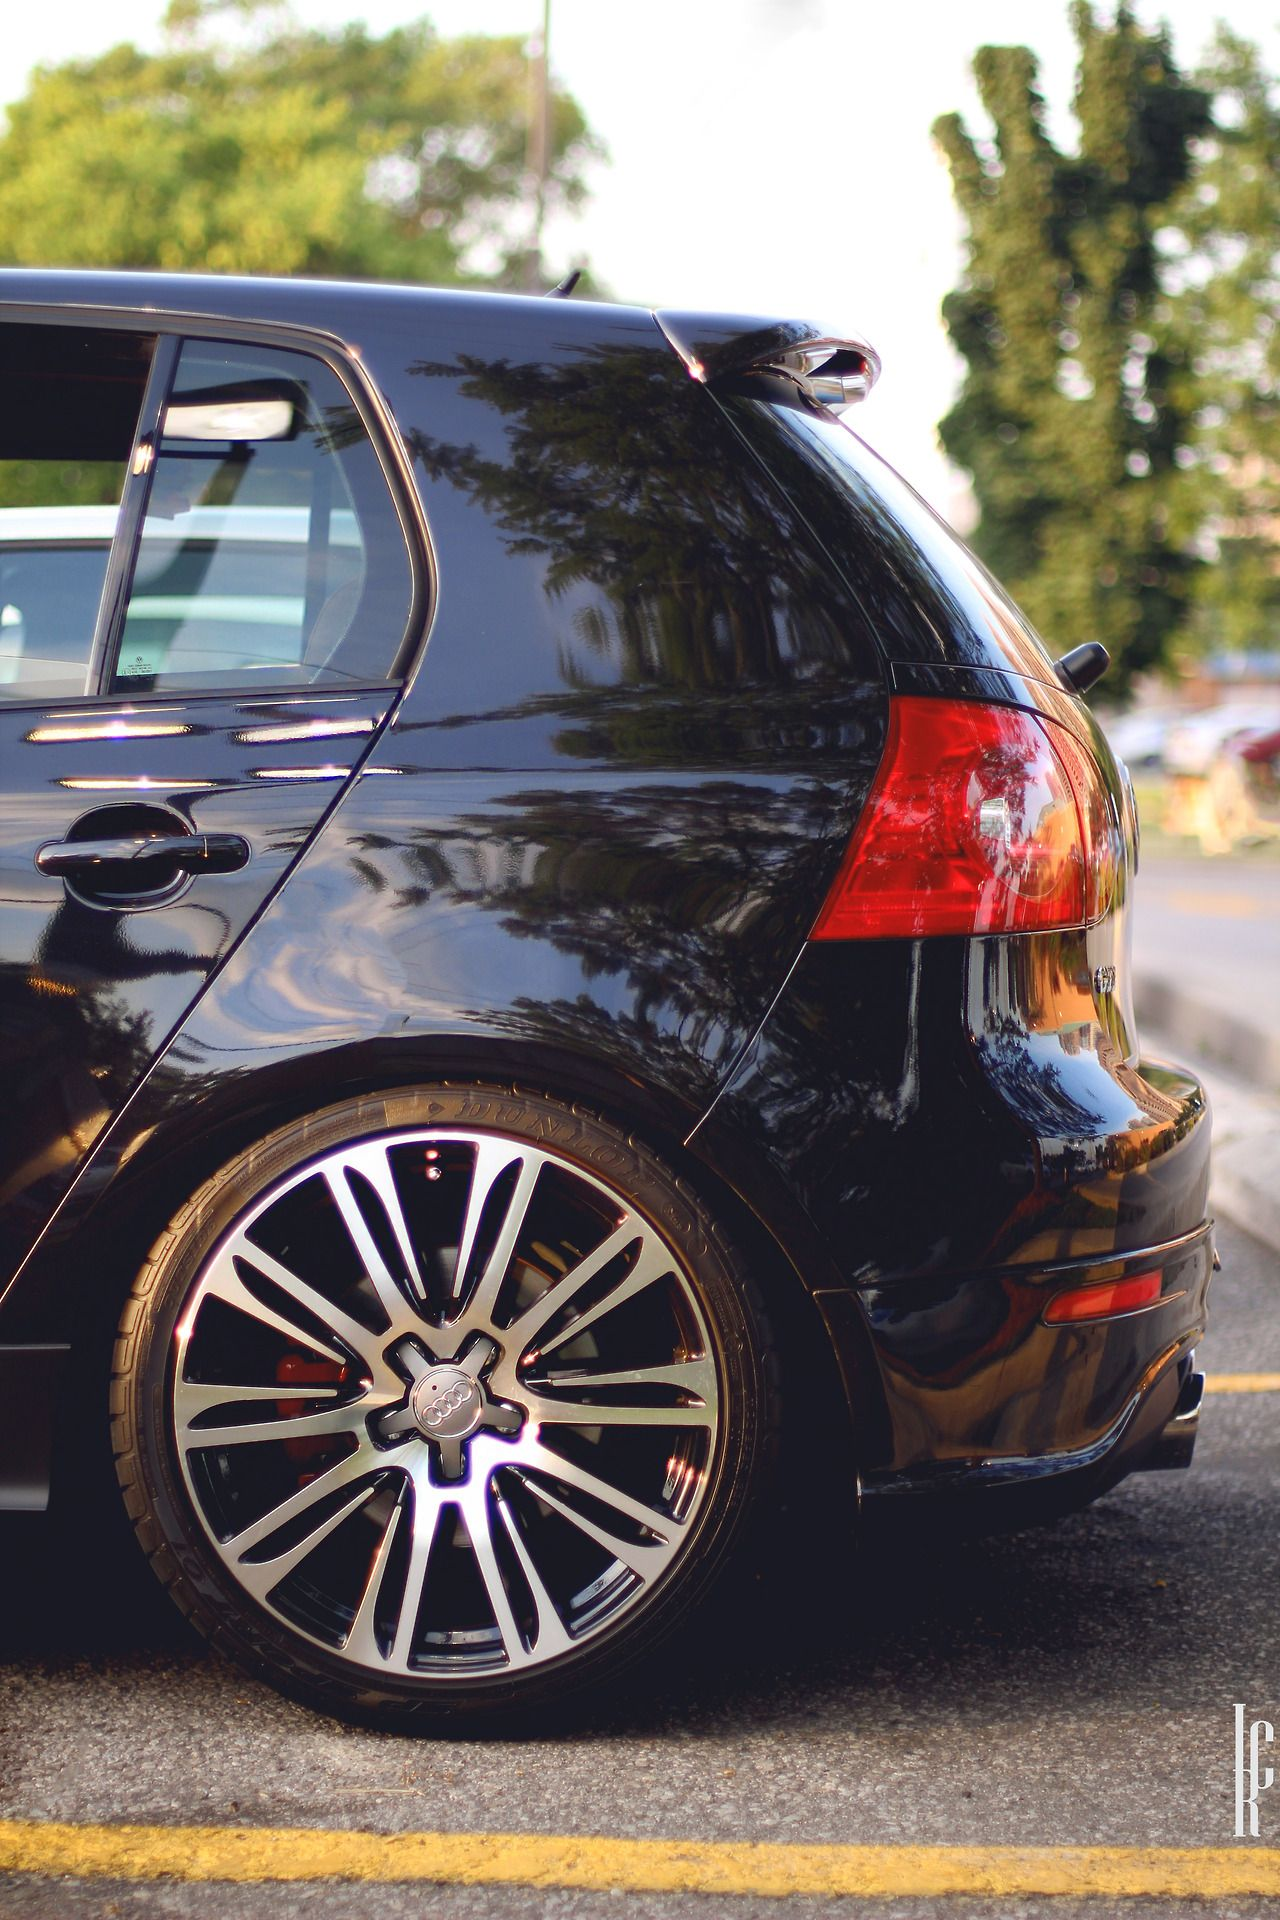 Golf Gti On Audi A7 Rims Audi Santamonicaaudi Www